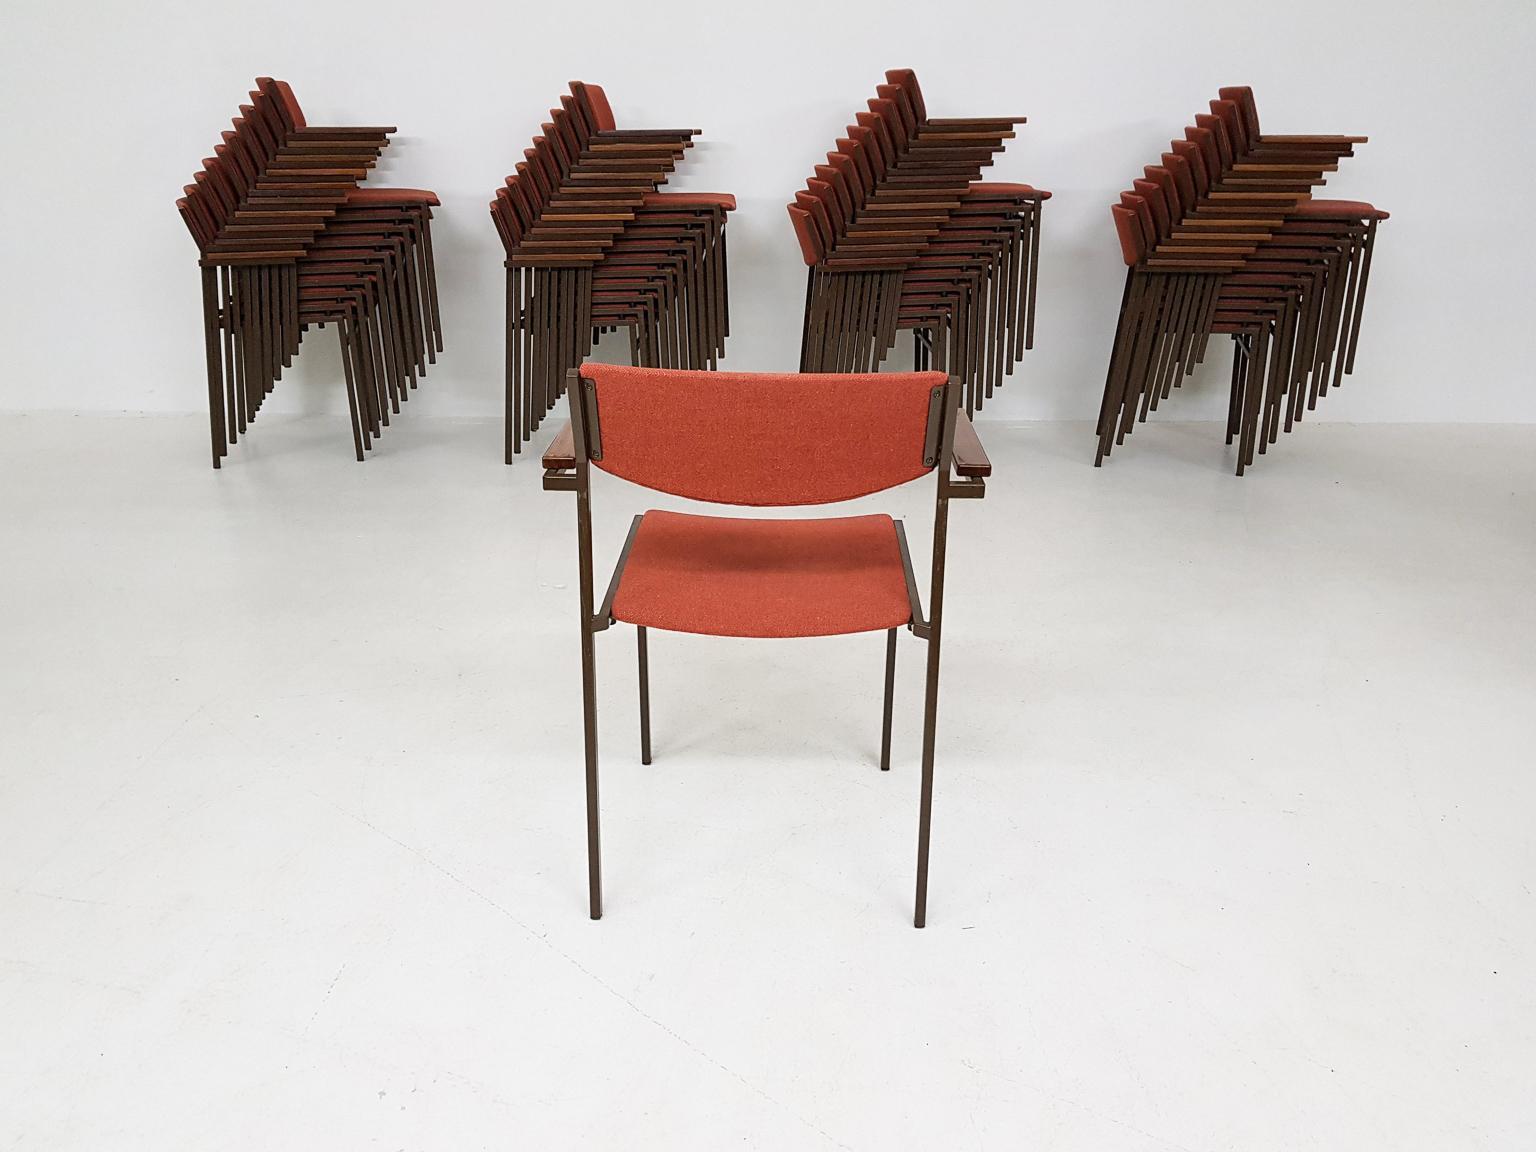 Large Set Of Dutch Midcentury Dining Or Stacking Chairs By Gijs Van Der Sluis